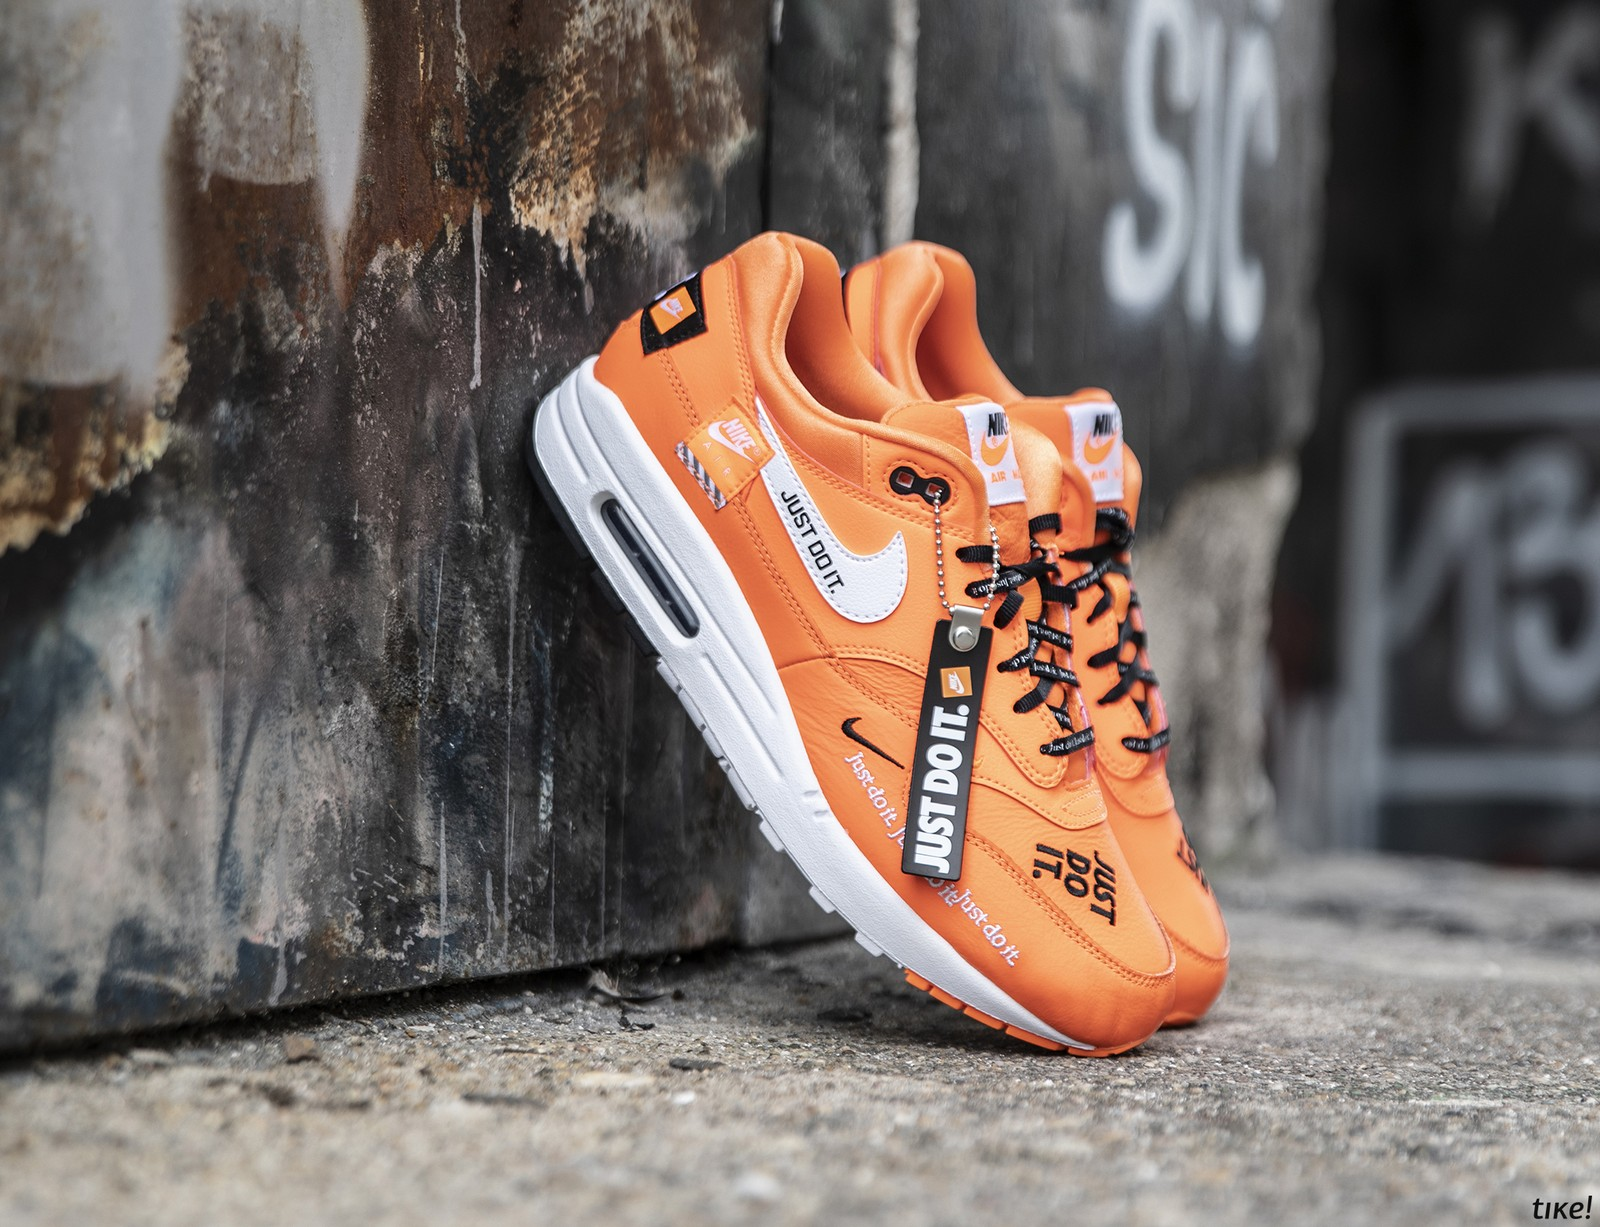 "651d05ba3ed02 Nike Air Max 1 ""Just Do It"" patike su perfektan izbor za leto za sve  devojke. Model u Pack White i Total Orange nijansama je dostupan instore i  online u ..."